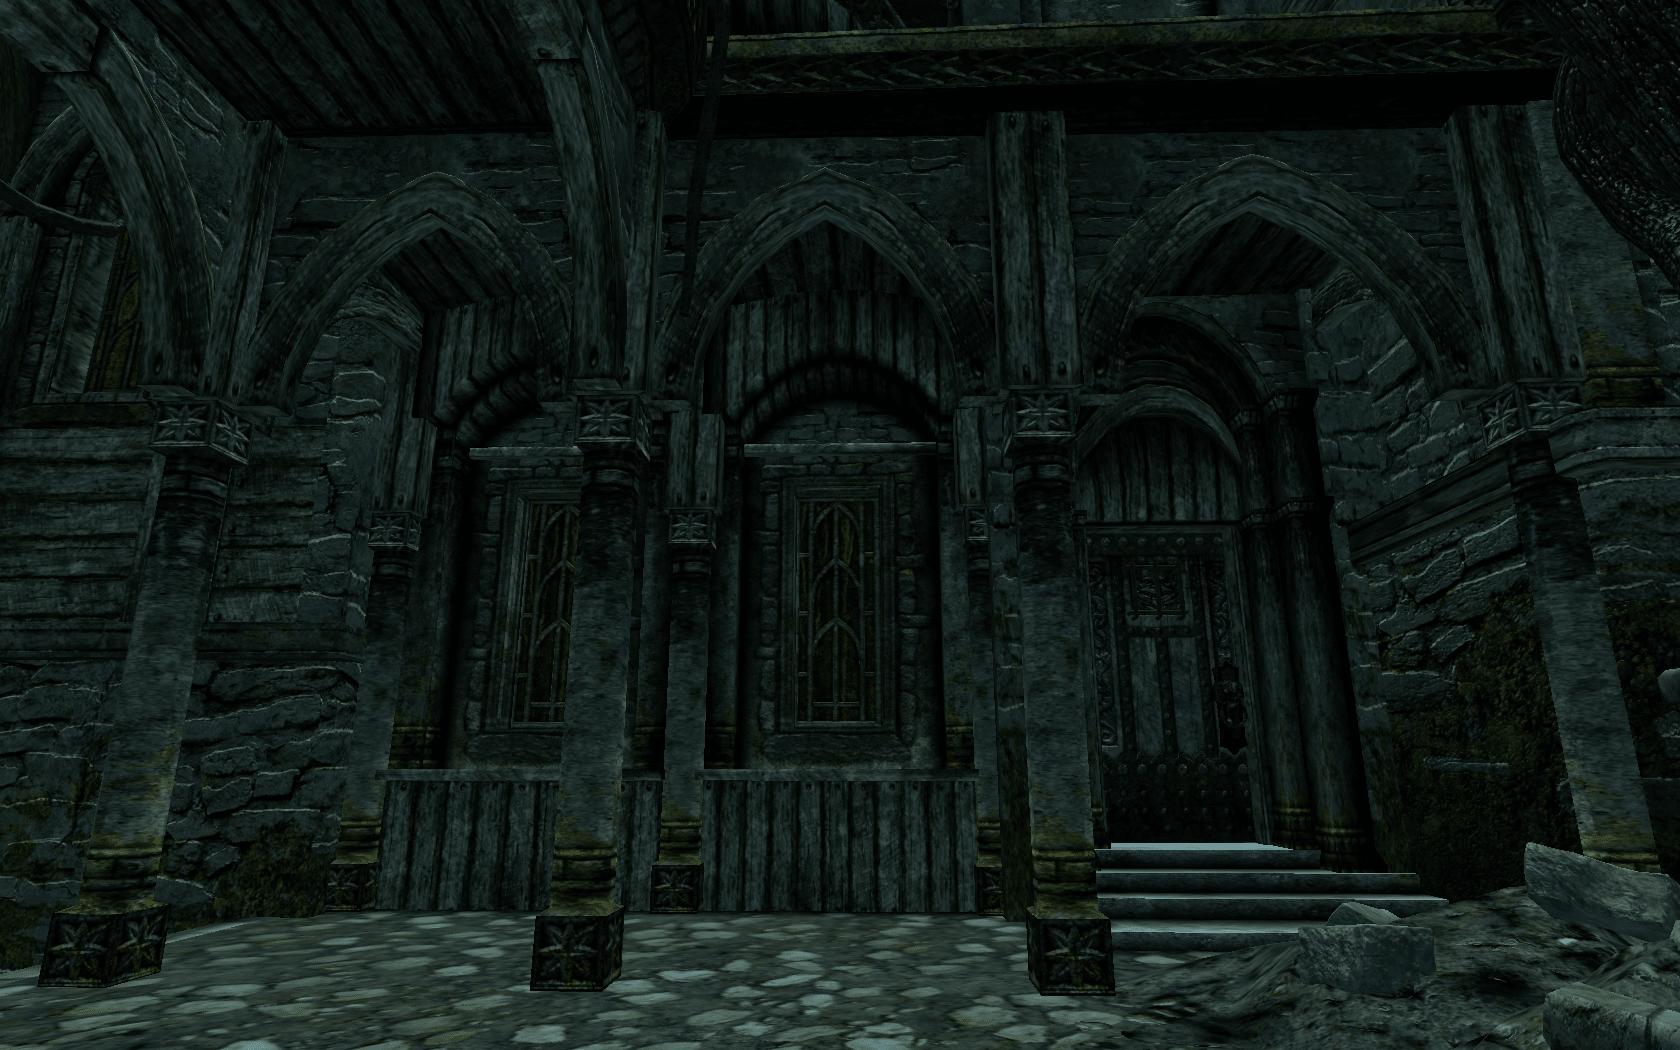 Hirrus Clutumnus' House